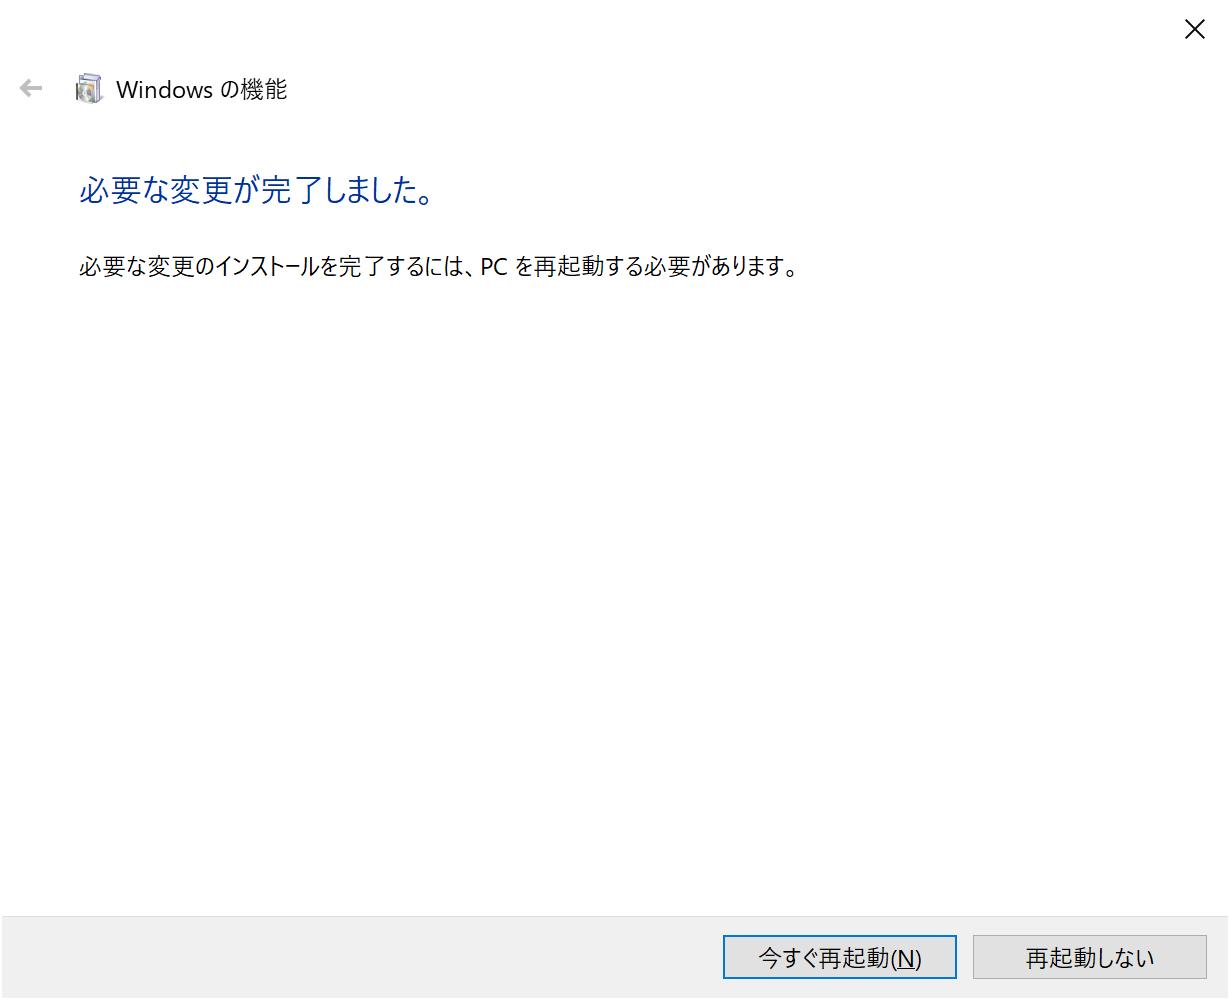 Windows 10の必要な機能の有効化設定完了後に表示されるWindows再起動を求める画面